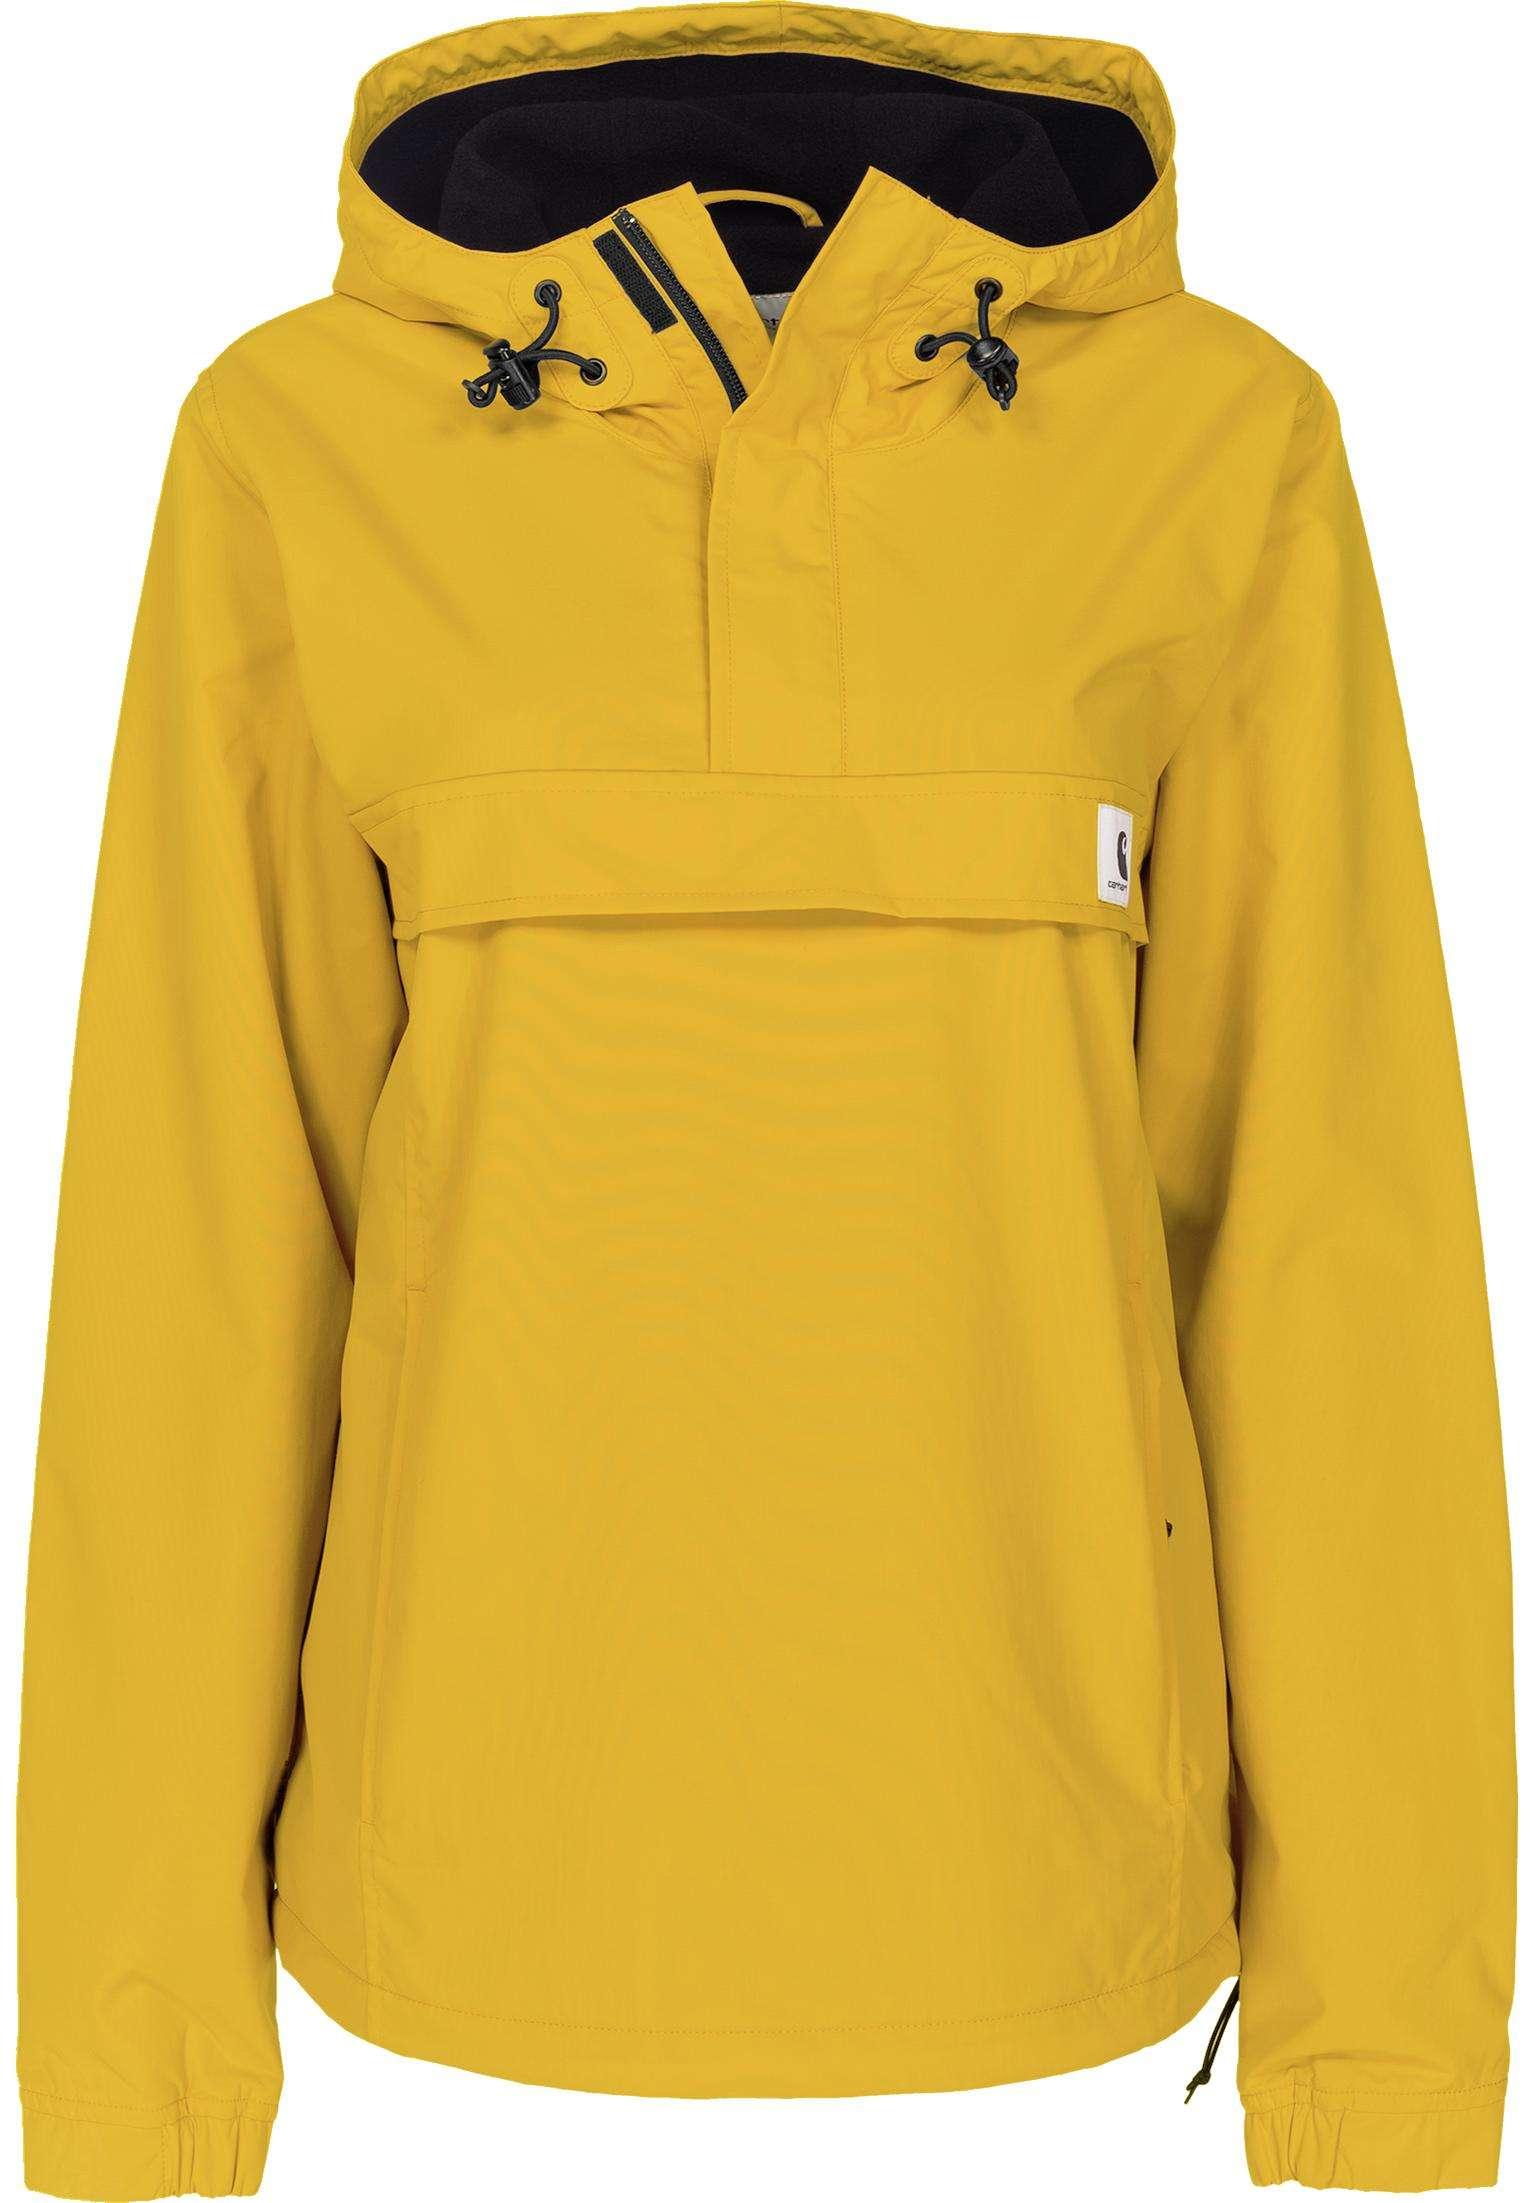 quince Nimbus pour Femme WIP Pullover Carhartt d'hiver W´ Vestes en wZFB16q6x